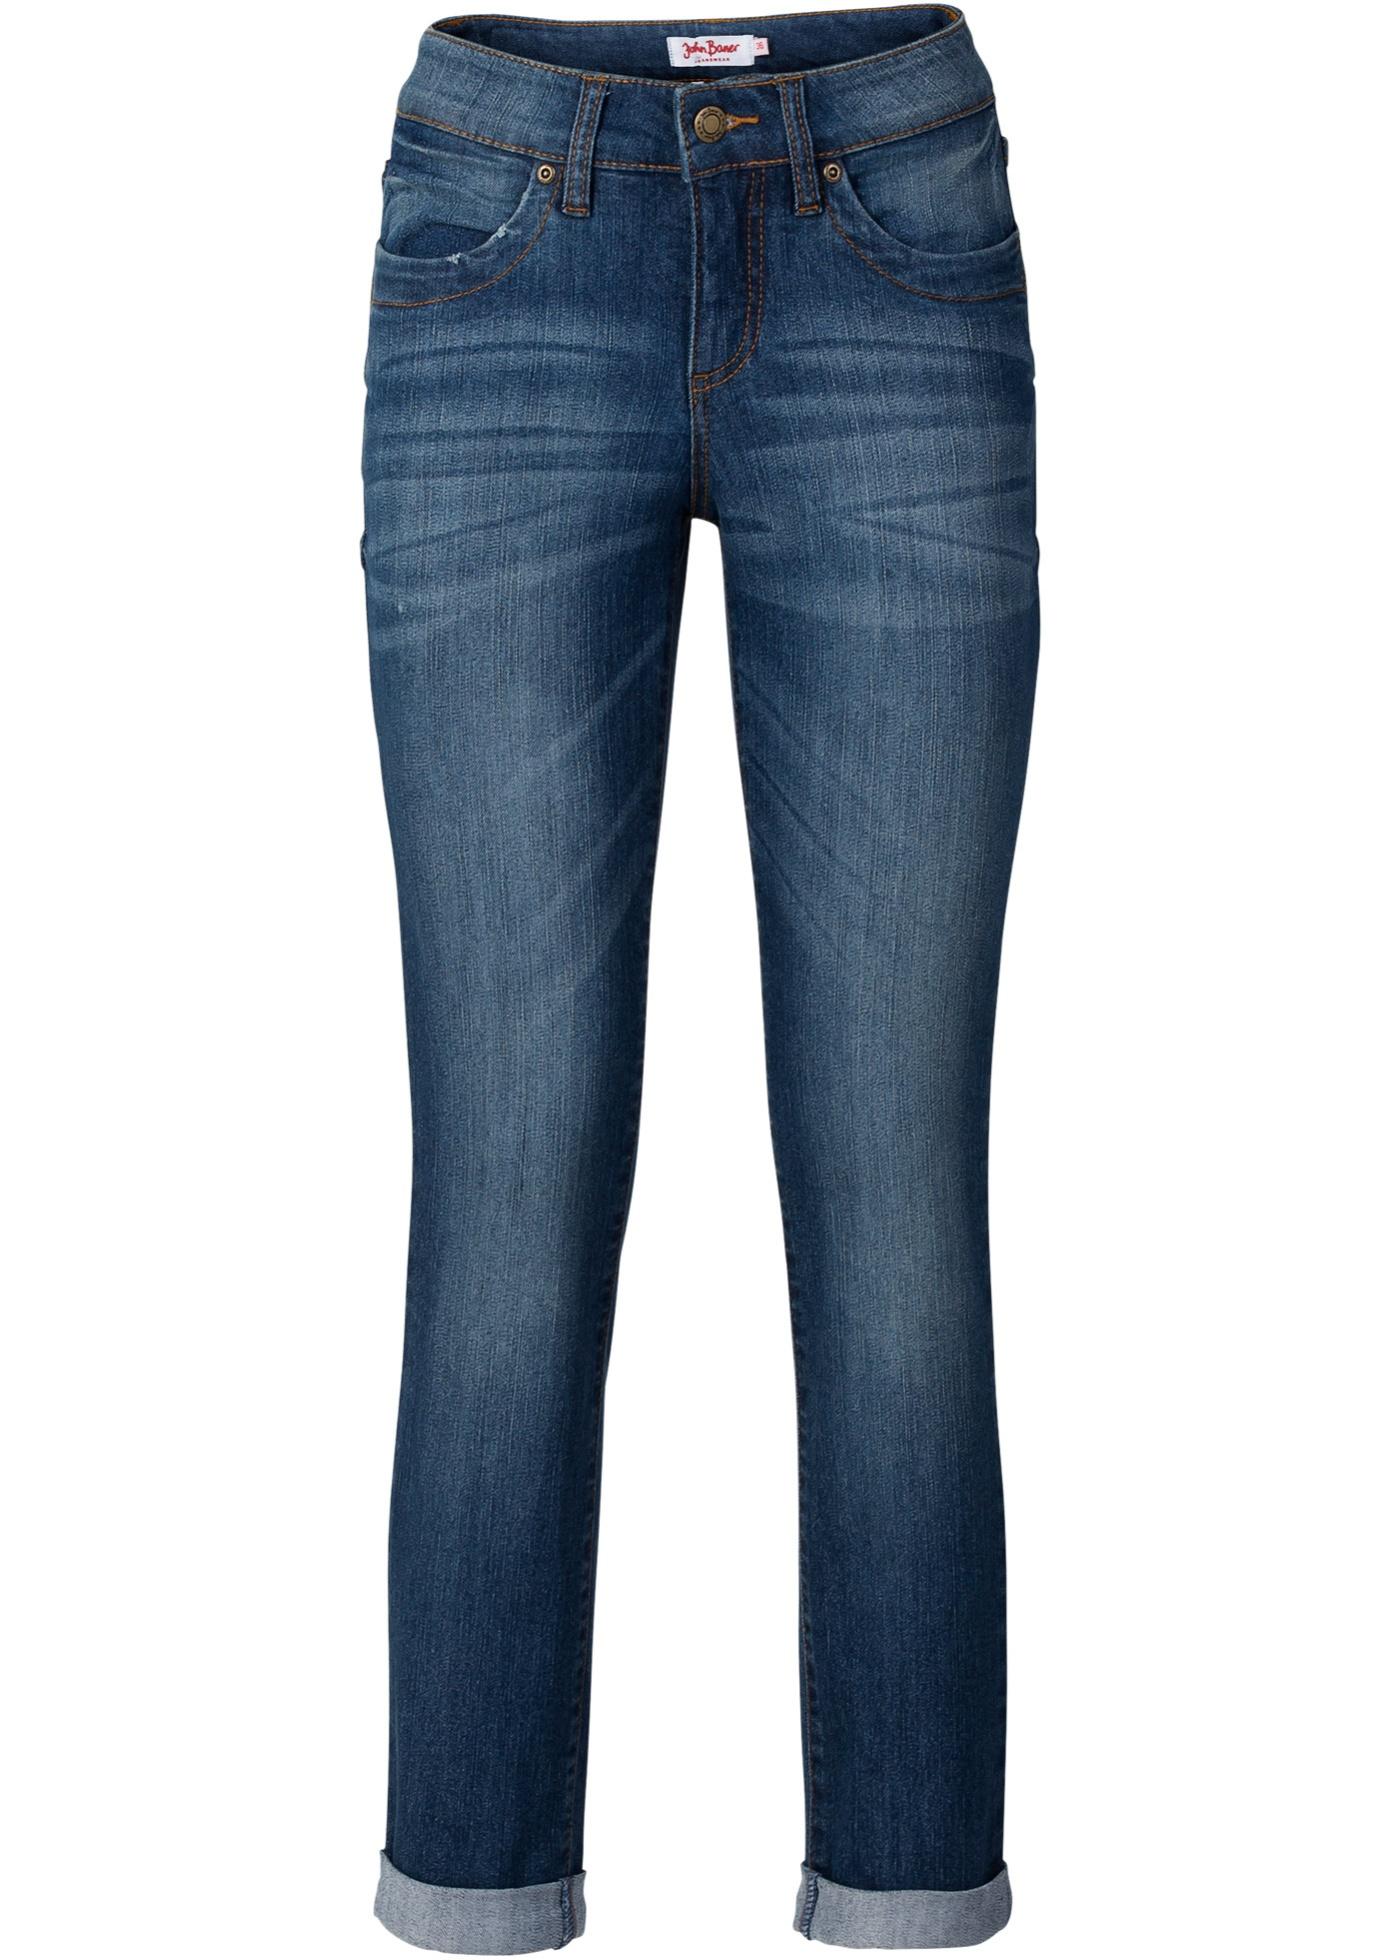 Bonprix - 7/8 jeans 199.00